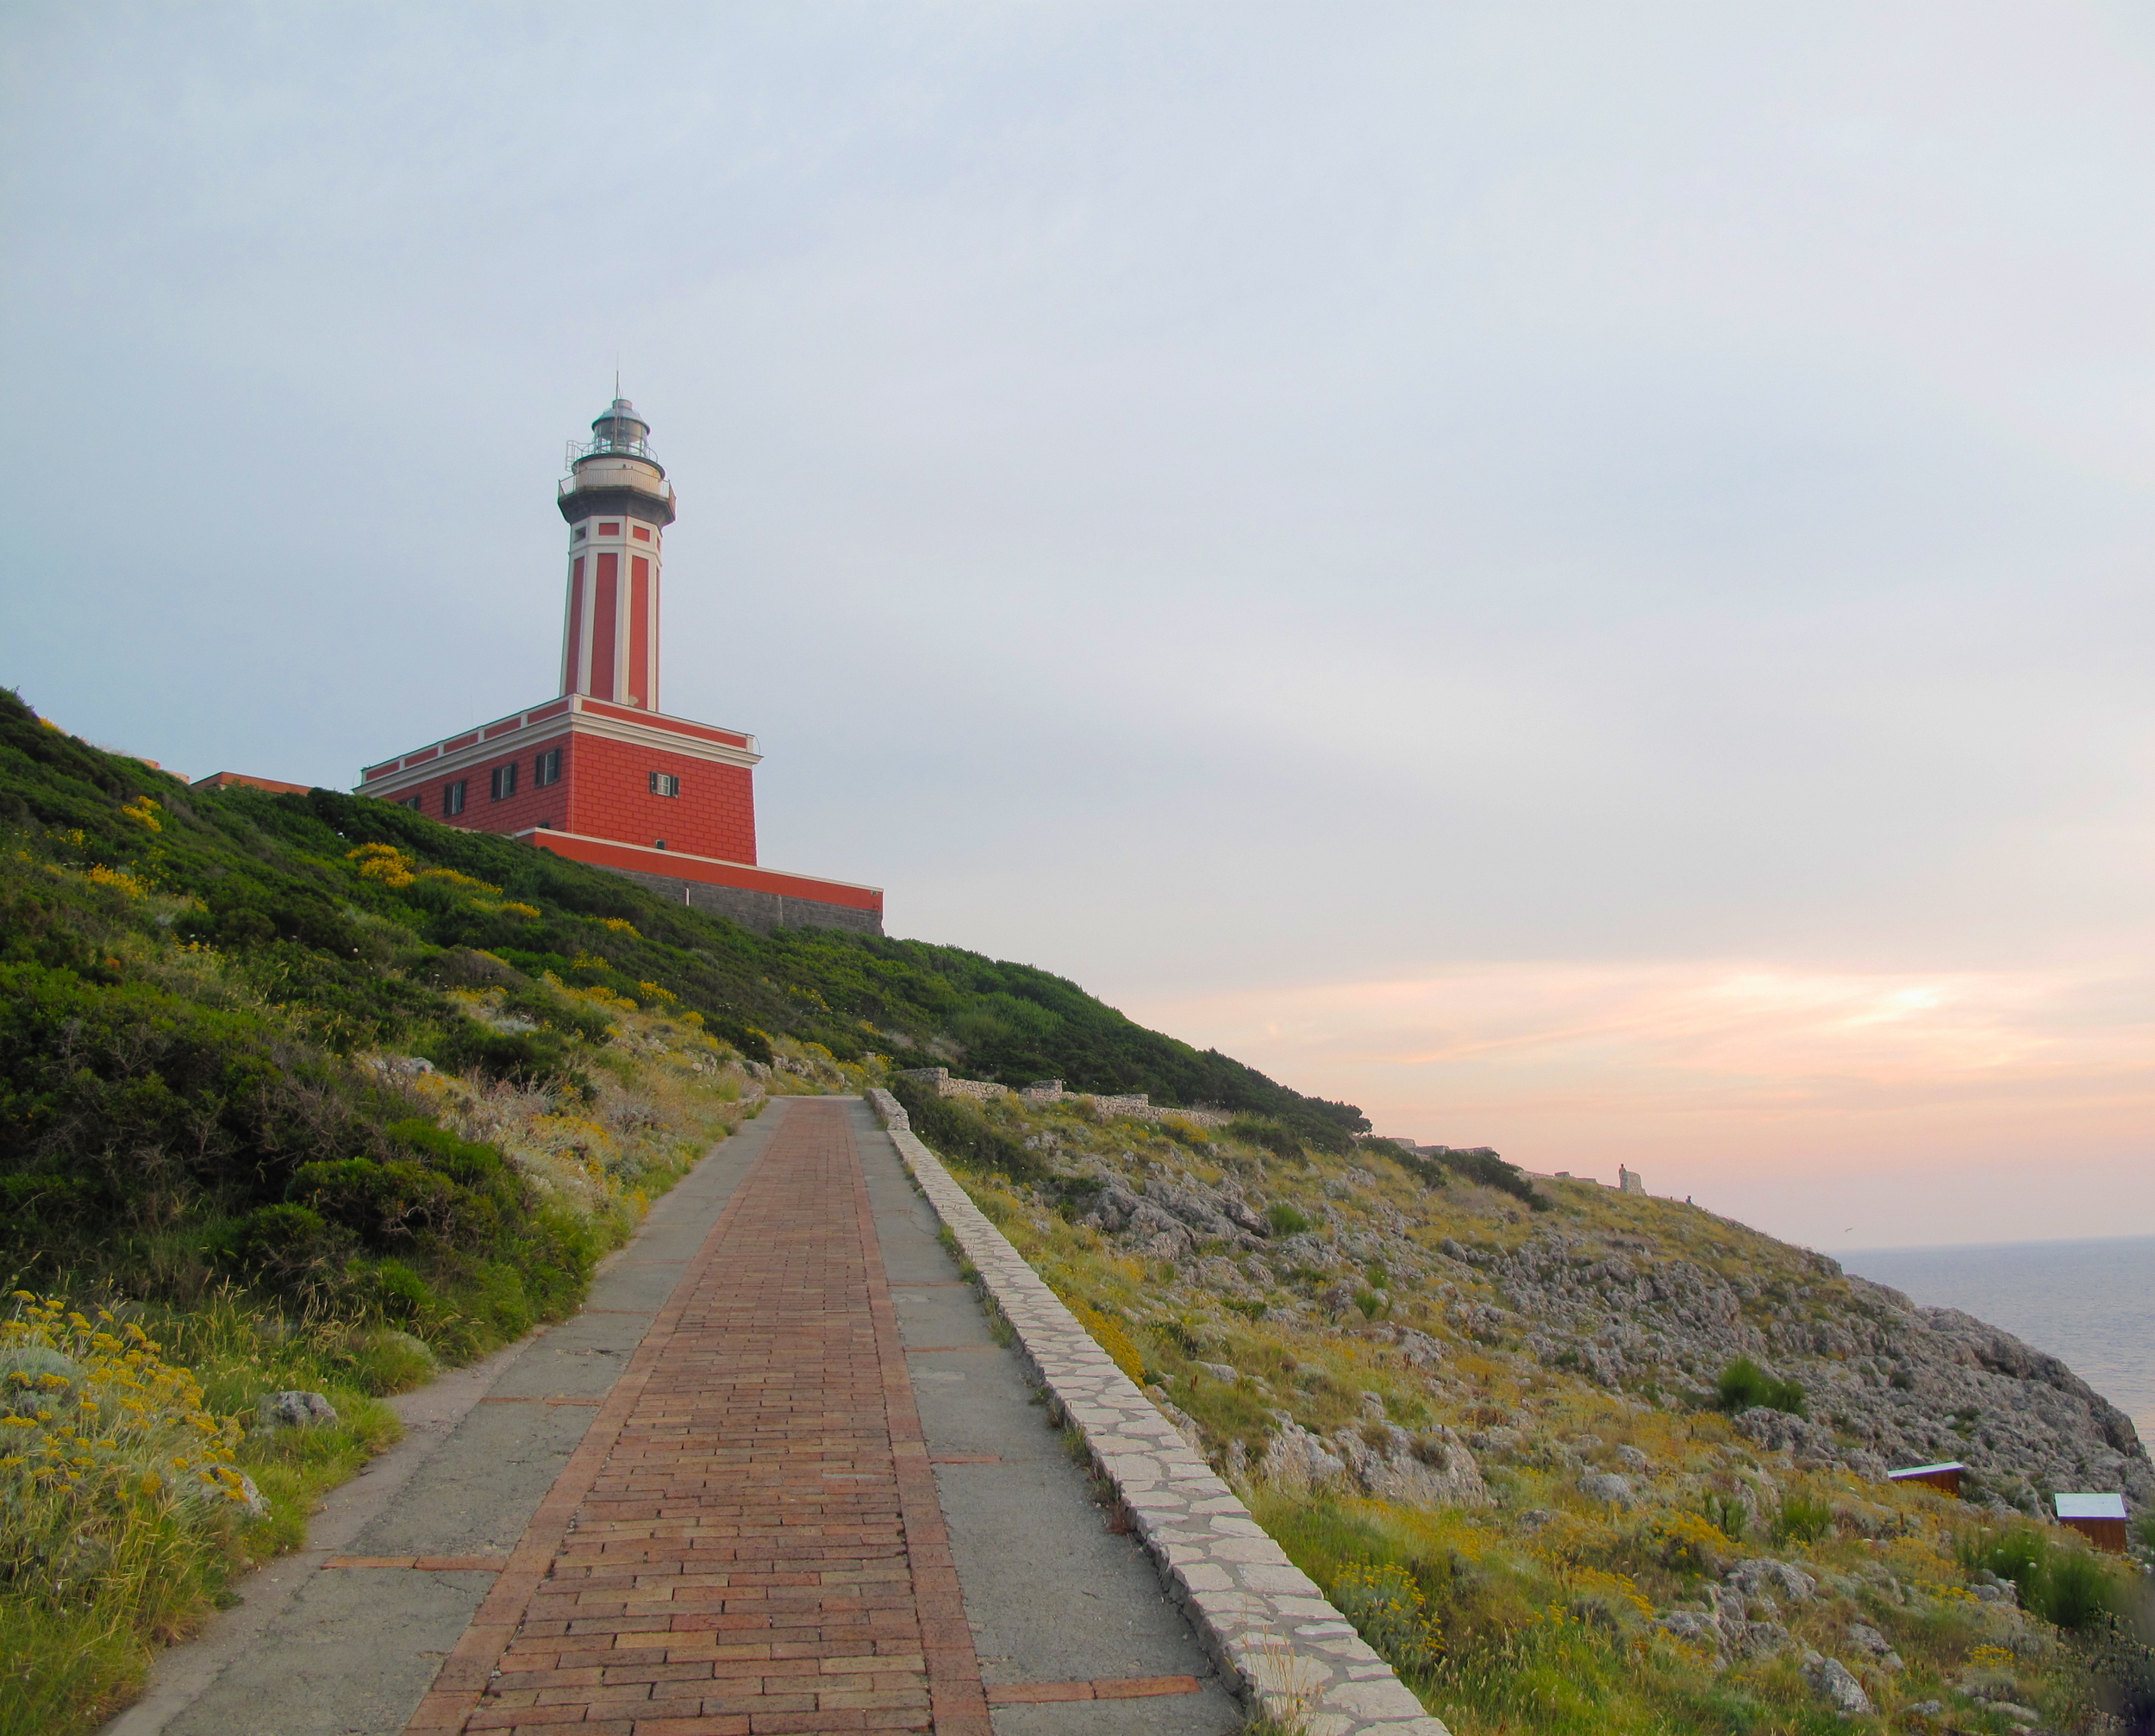 Punta Carena Lighthouse on Anacapri